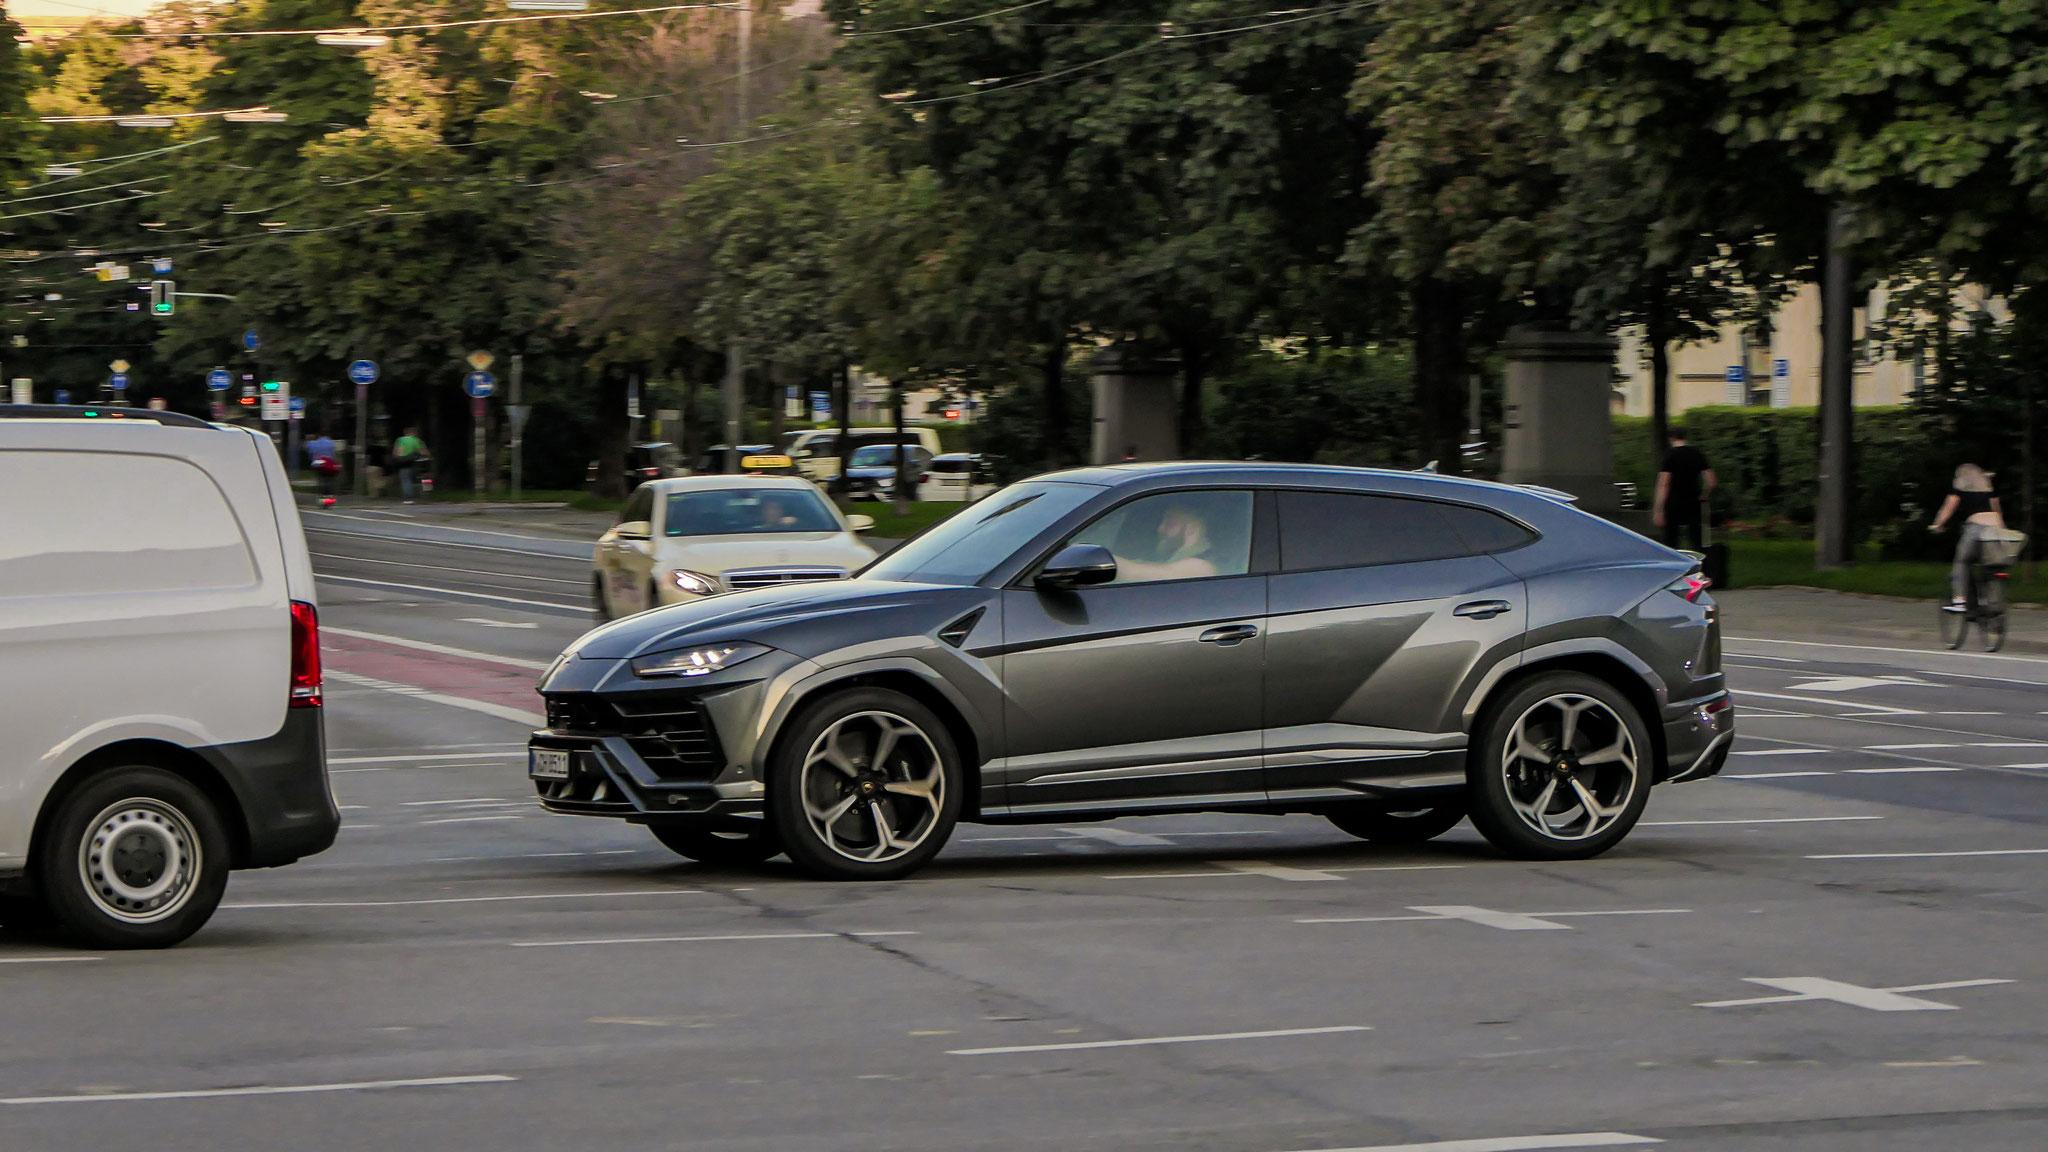 Lamborghini Urus - M-CH-8511